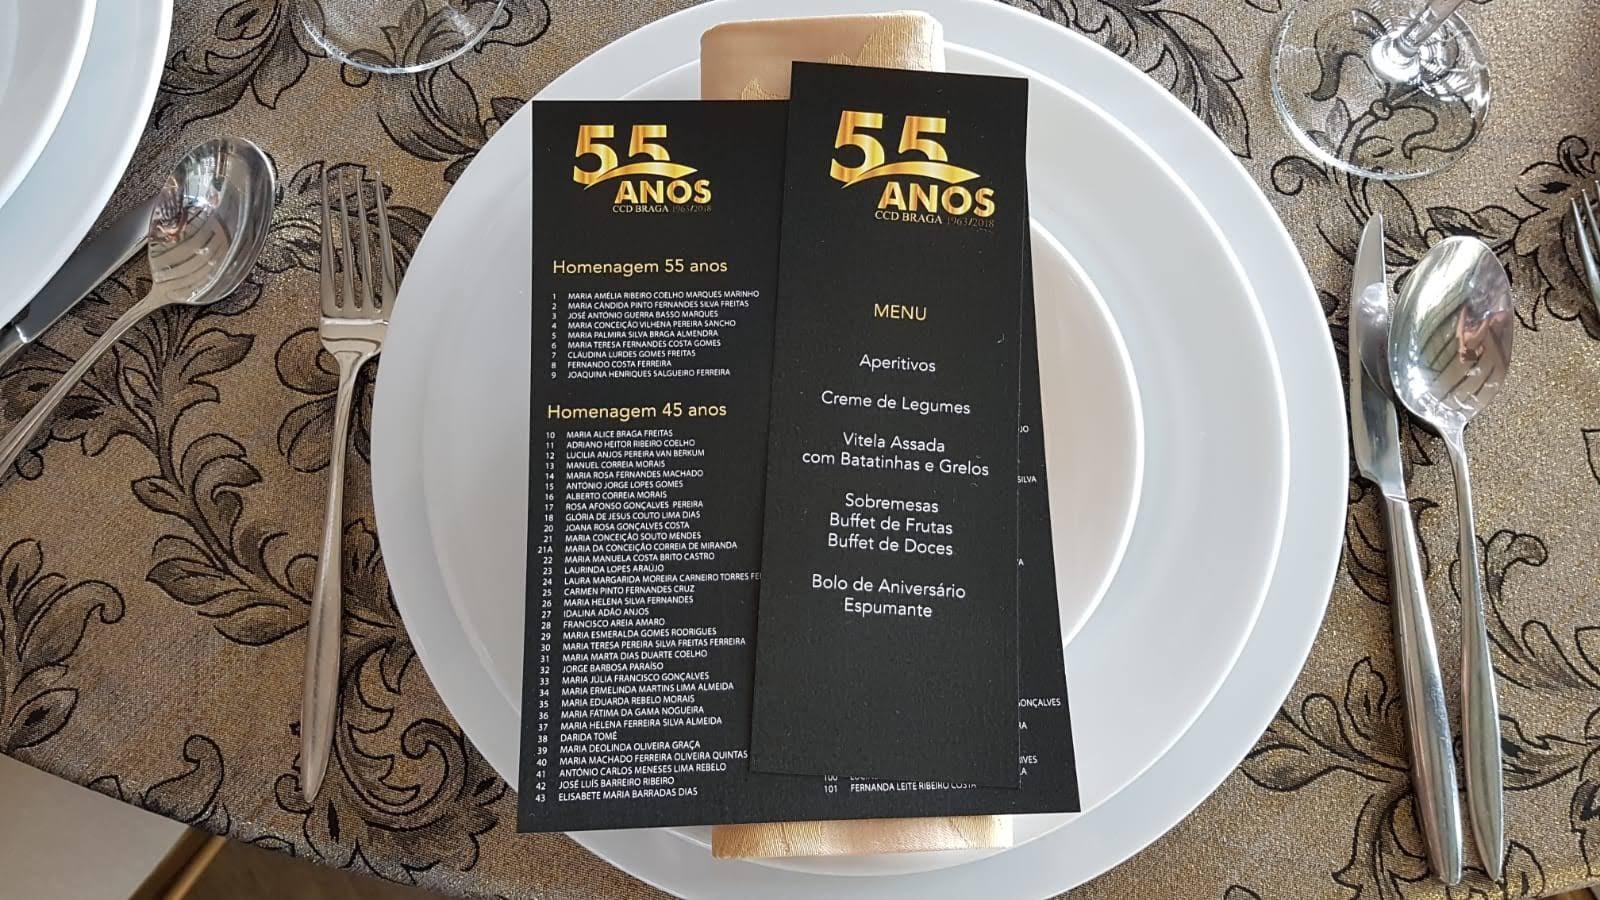 55º Aniversário CCD Braga